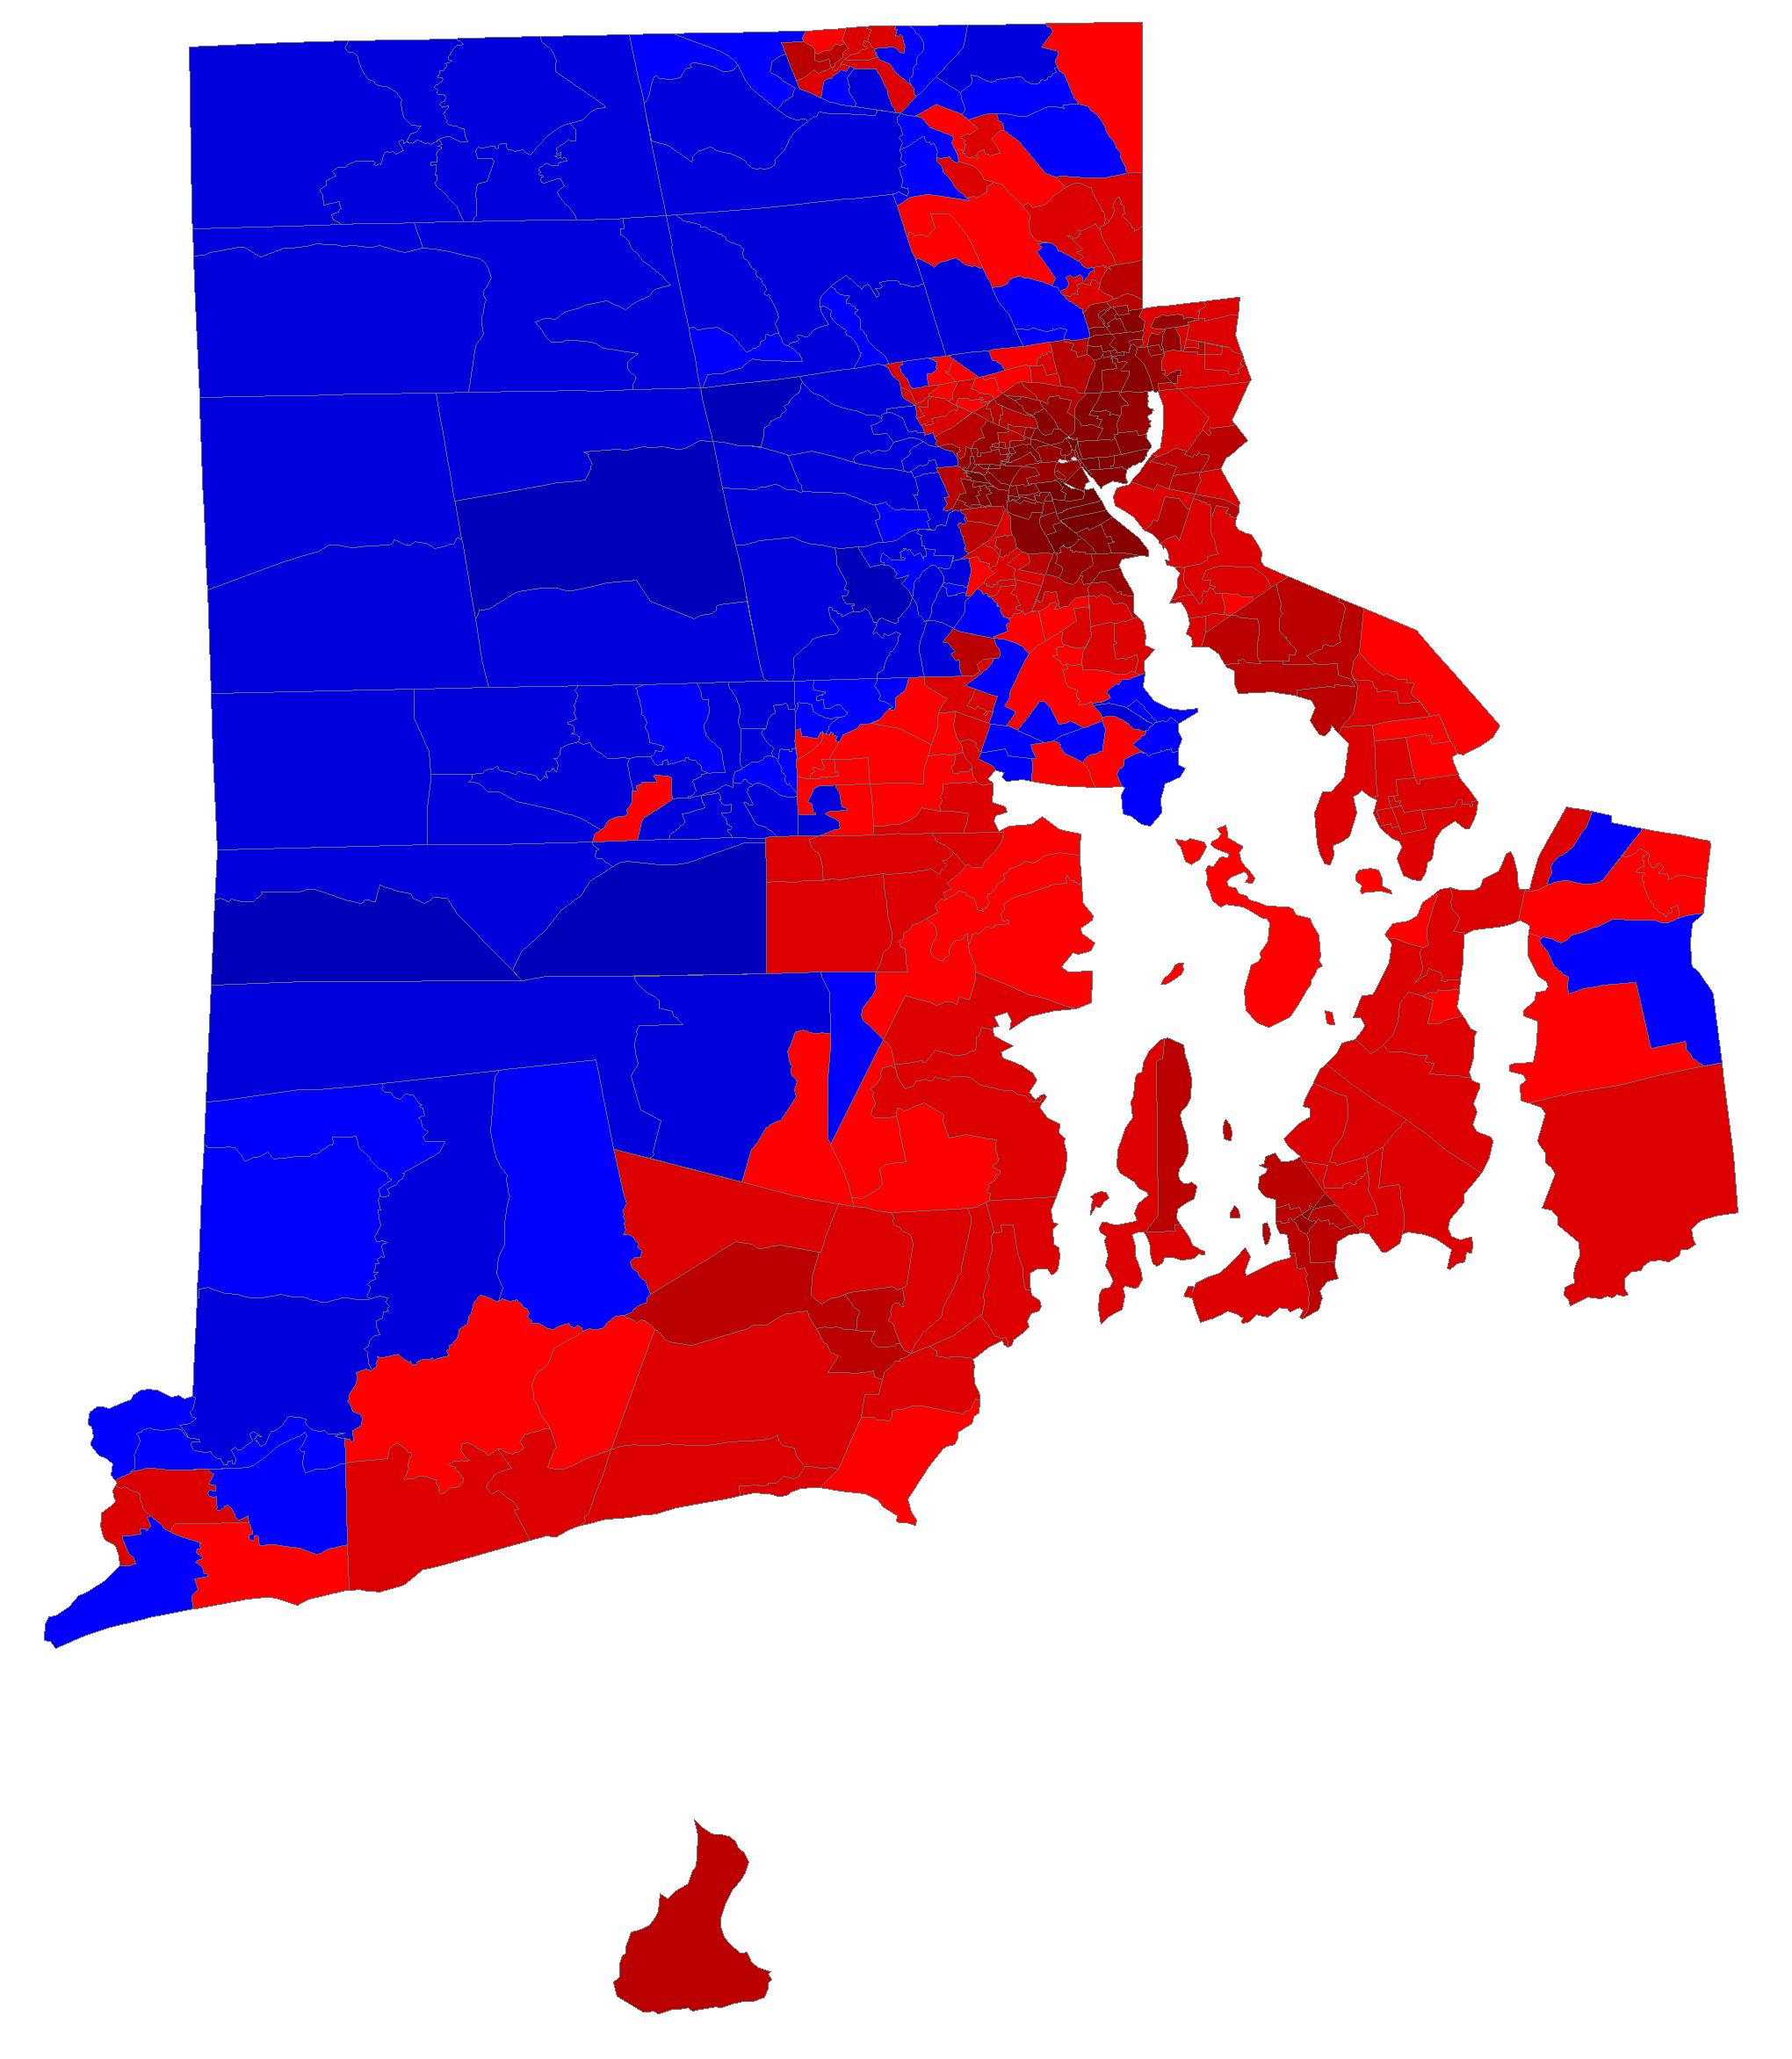 RIs Precinct Map Thread - 2016 us presidential election precint map